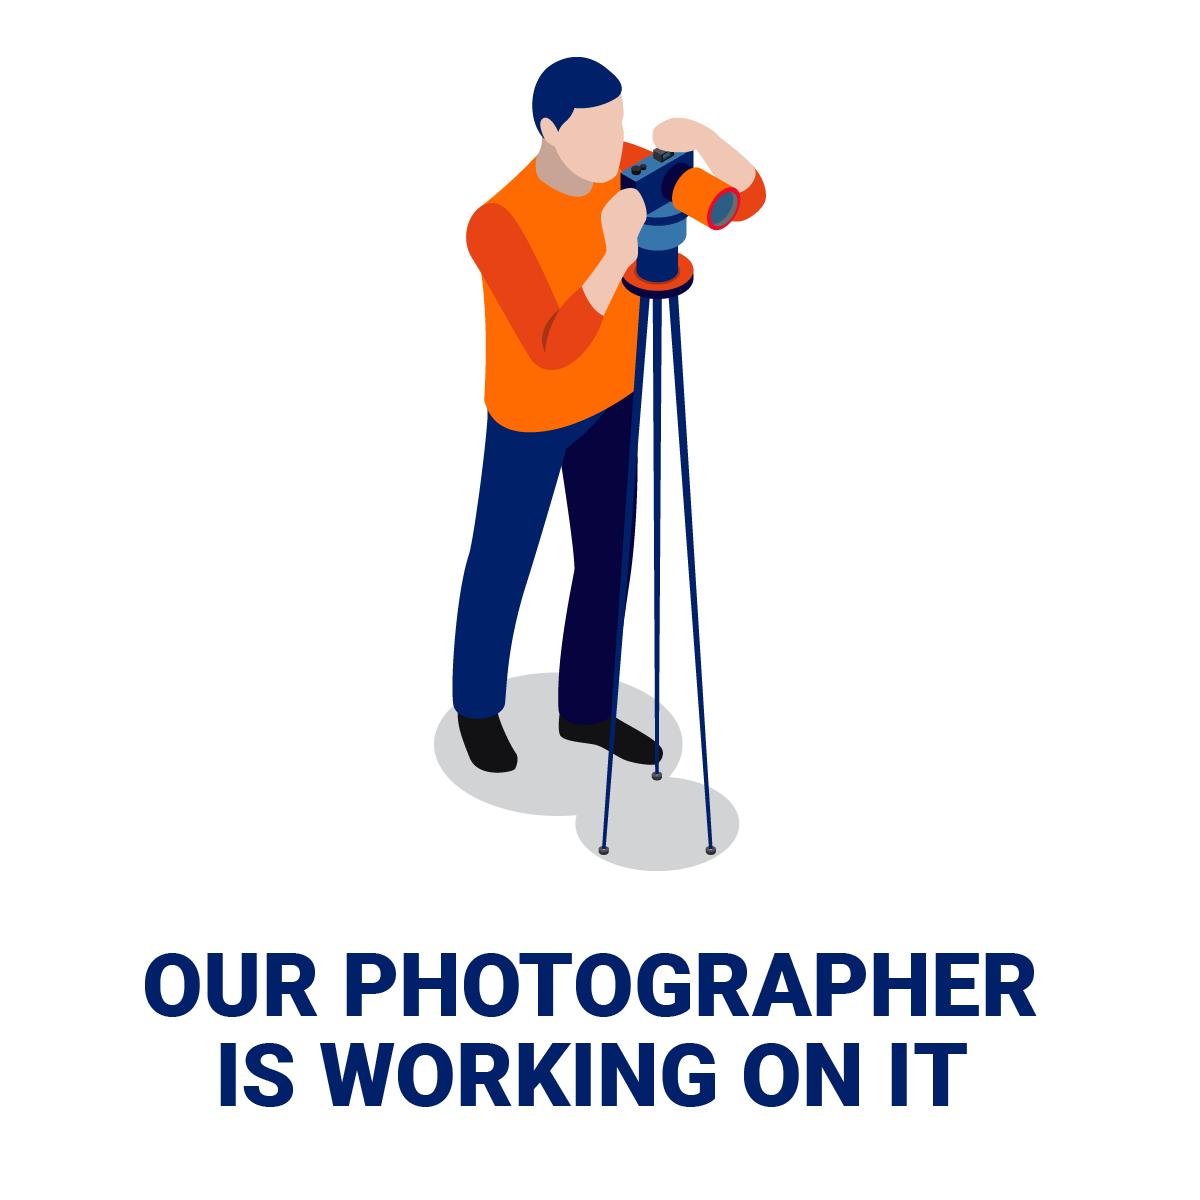 XHMDT R320 R420 R520 HEATSINK5